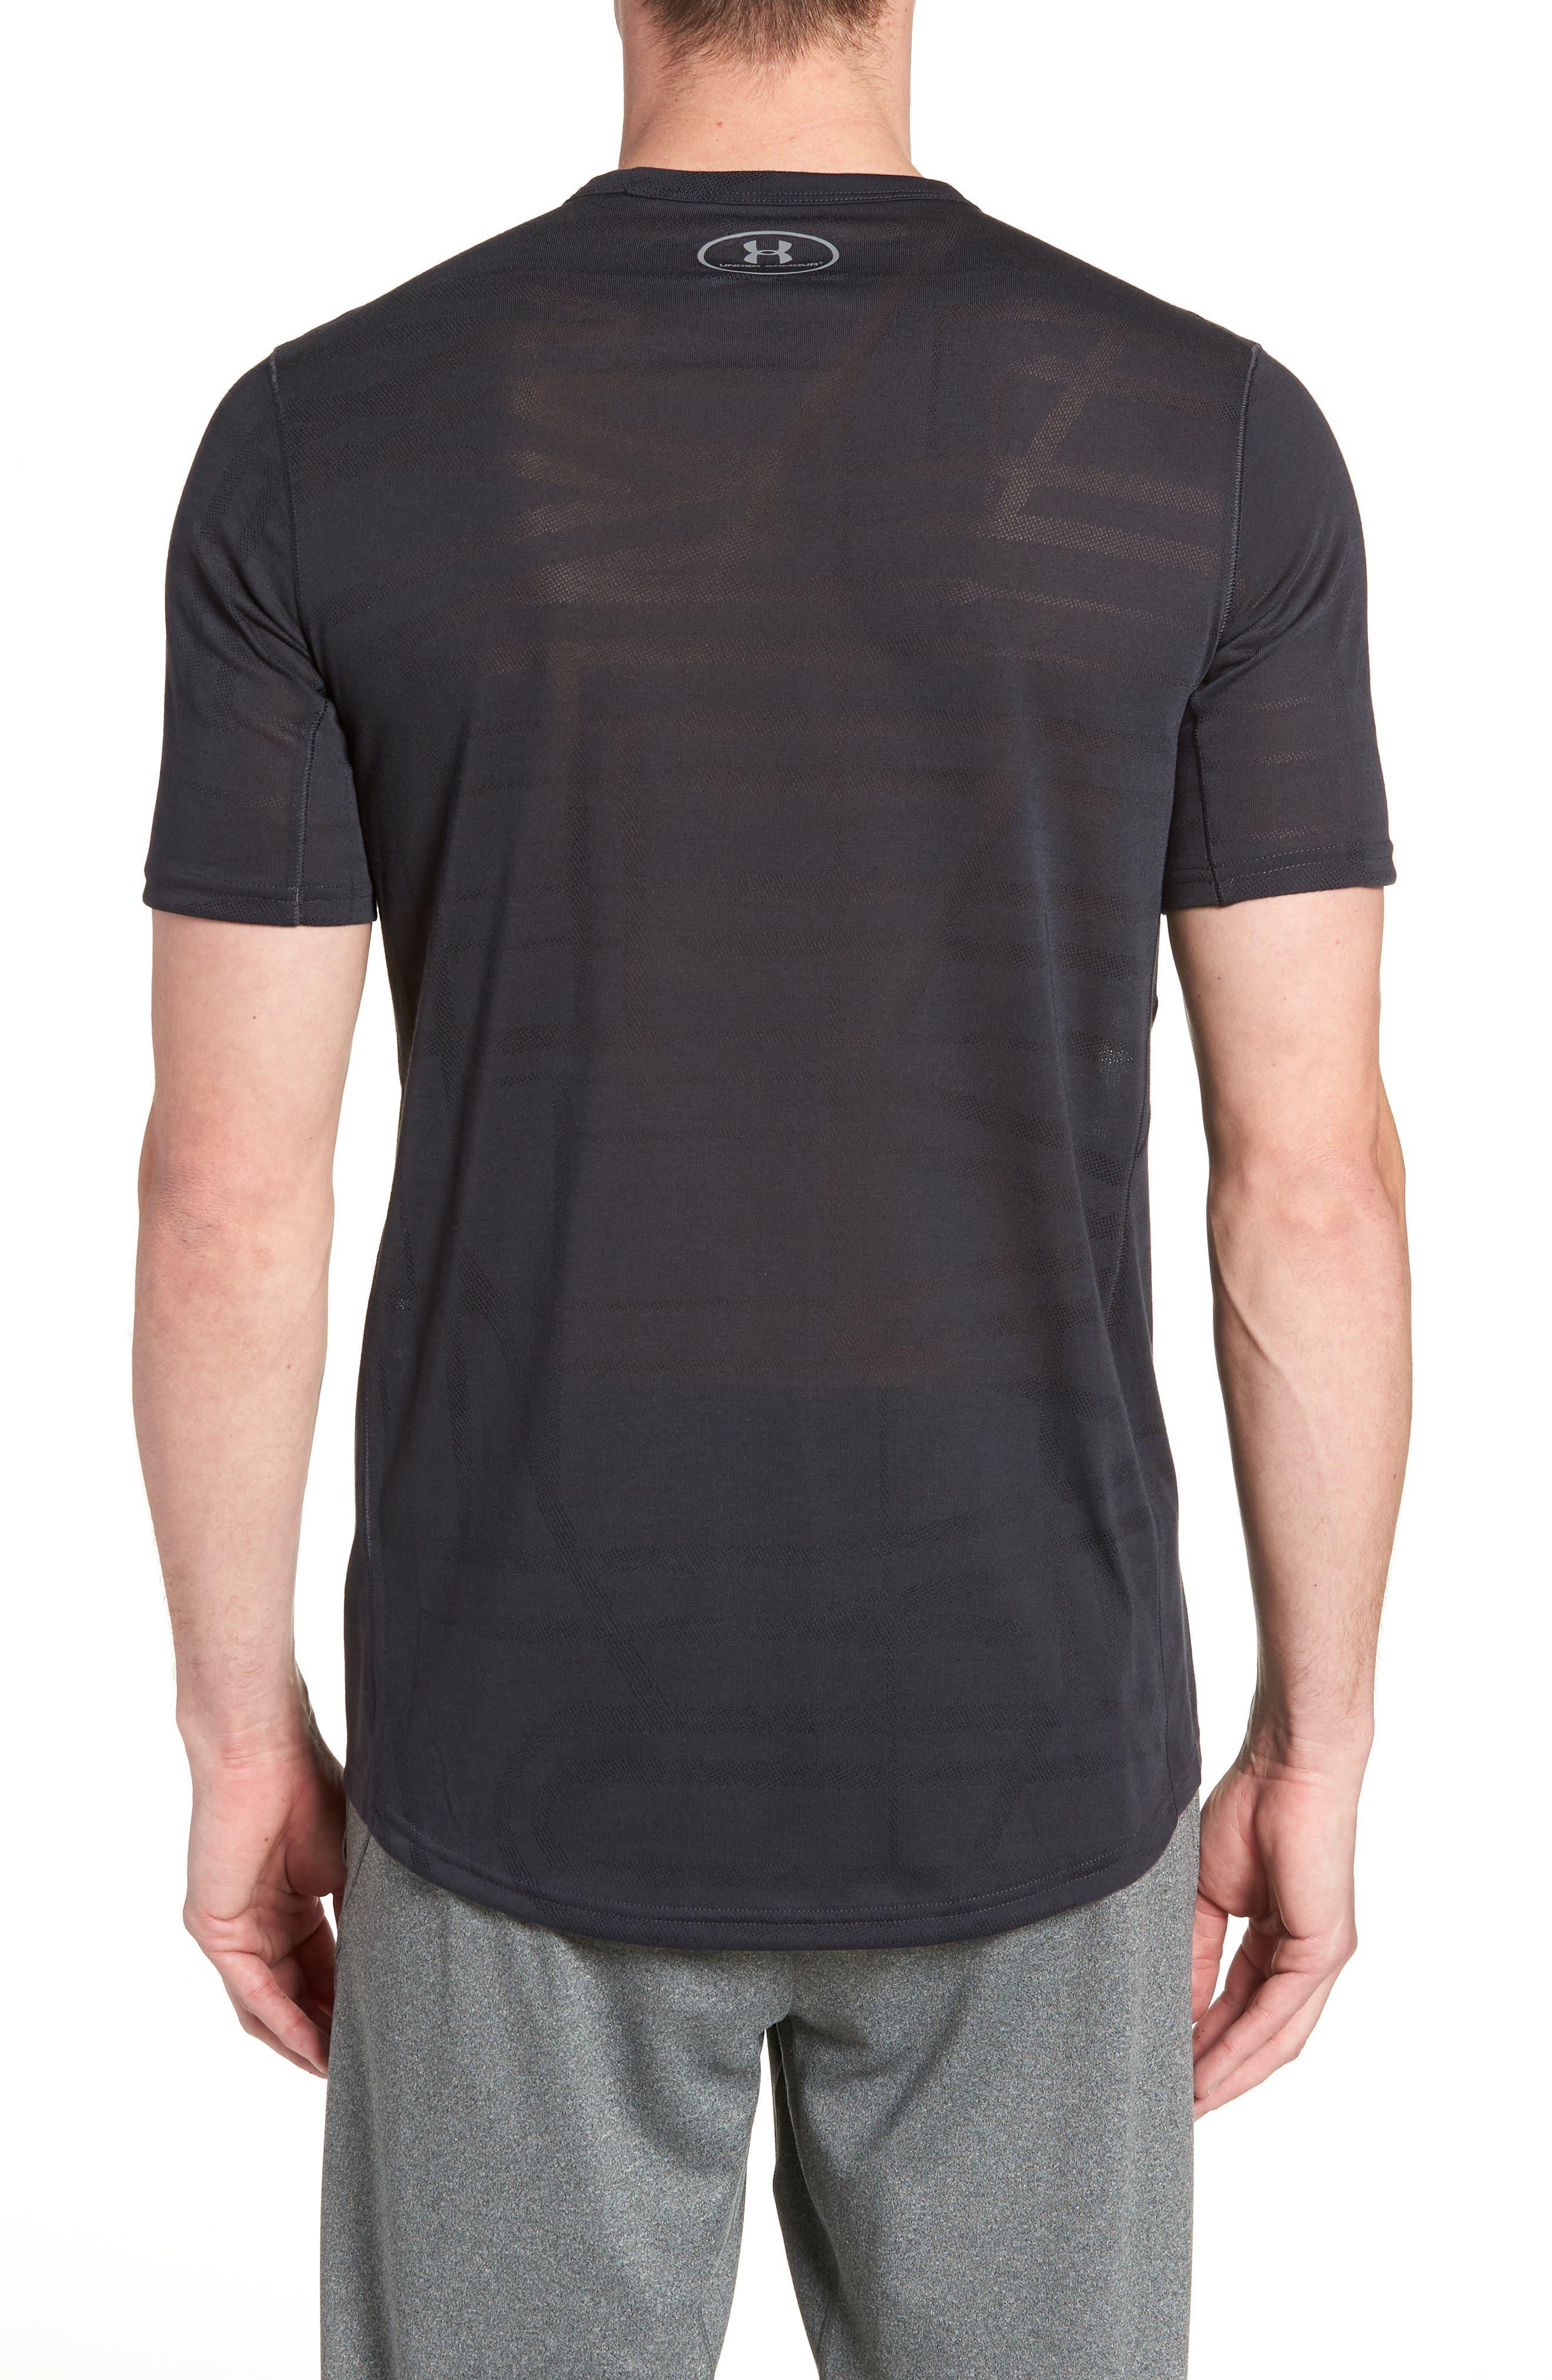 Threadborne Elite Crewneck T-Shirt,                             Alternate thumbnail 2, color,                             Black/ Graphite